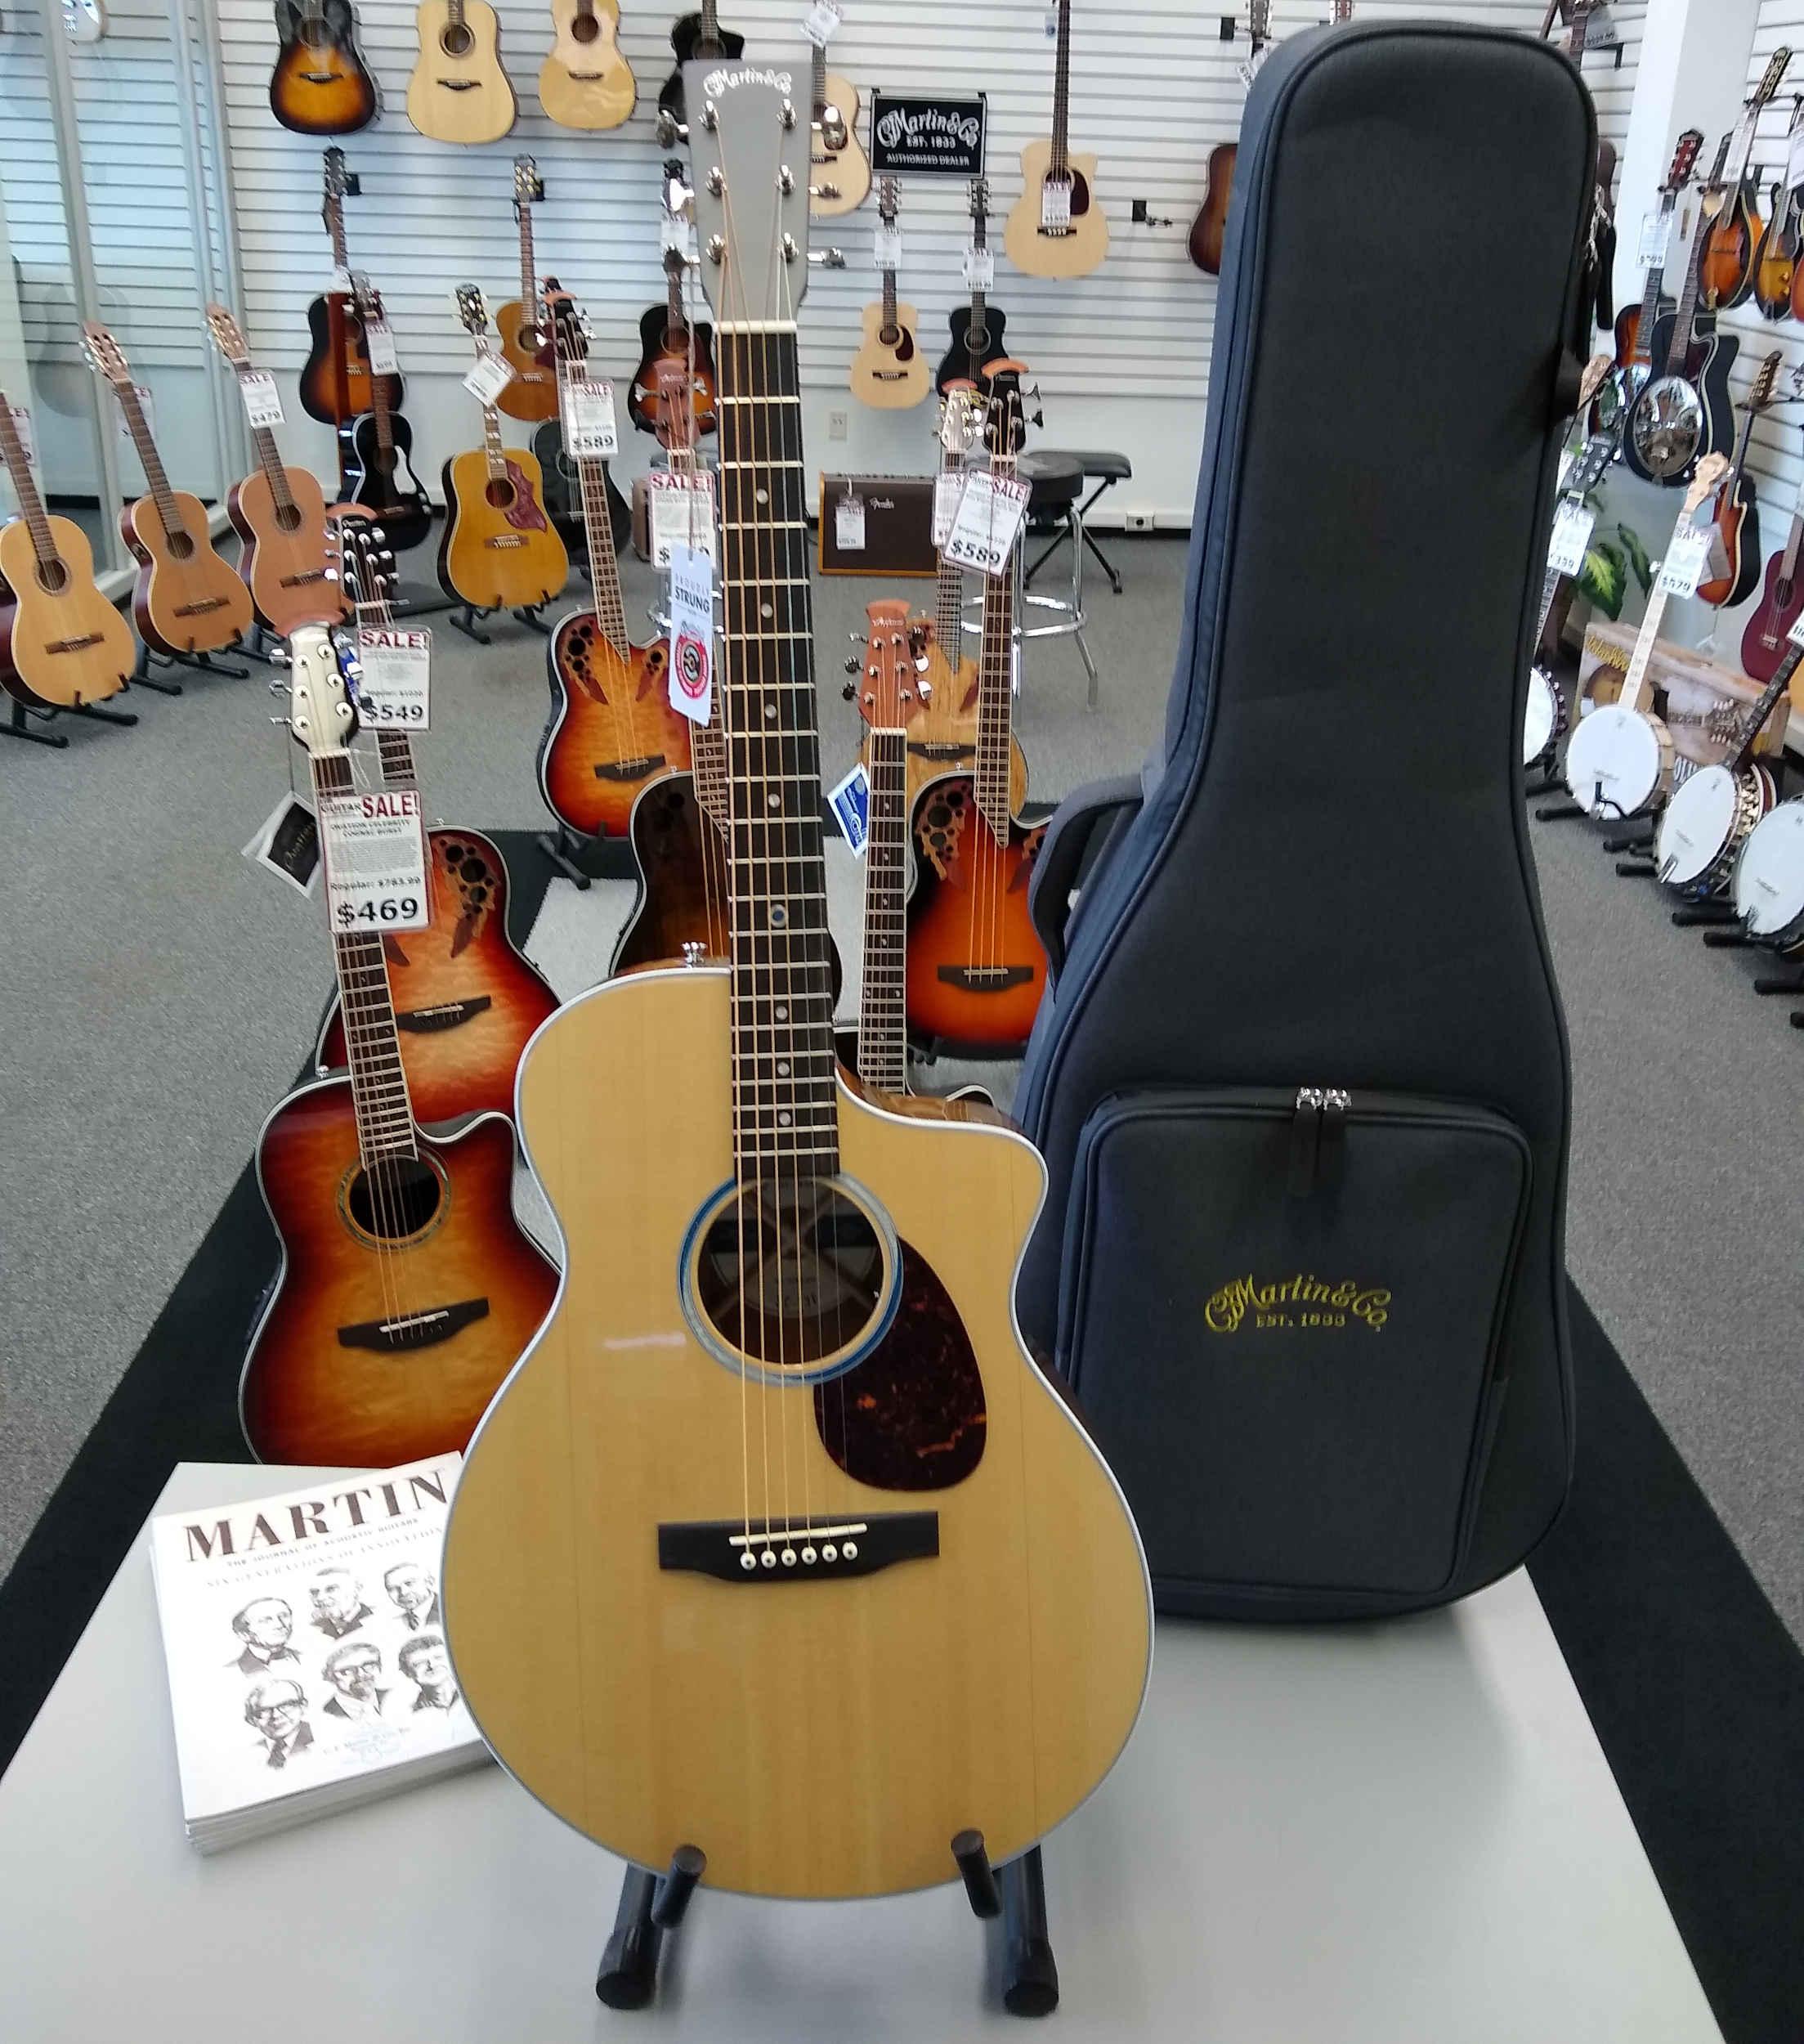 Martin SC13E Acoustic Guitar